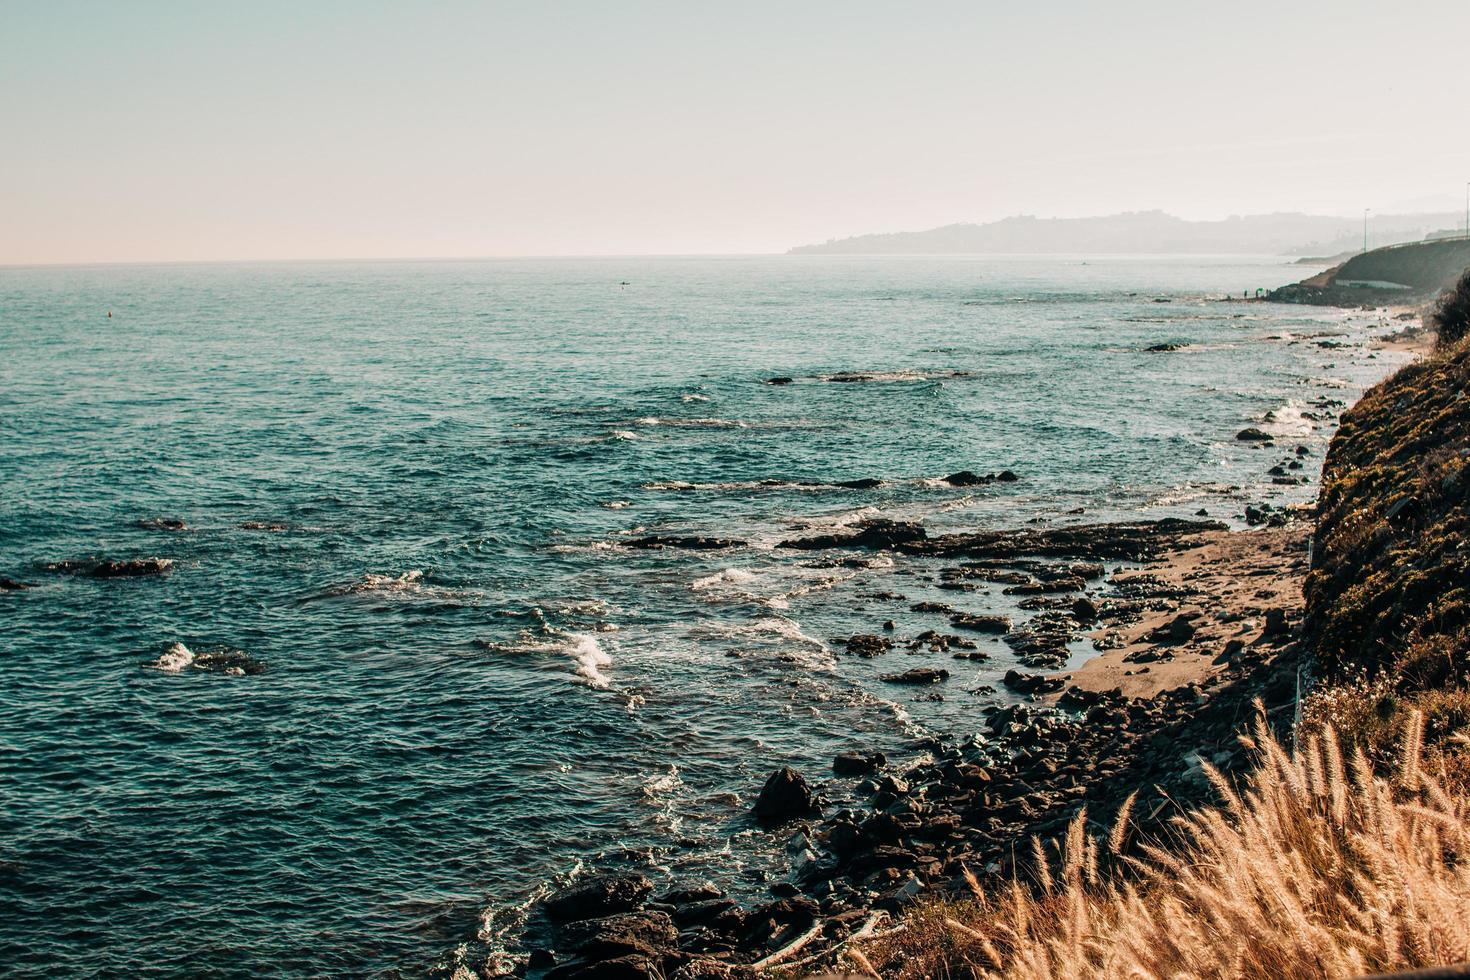 havsvågor kraschar på stenar foto